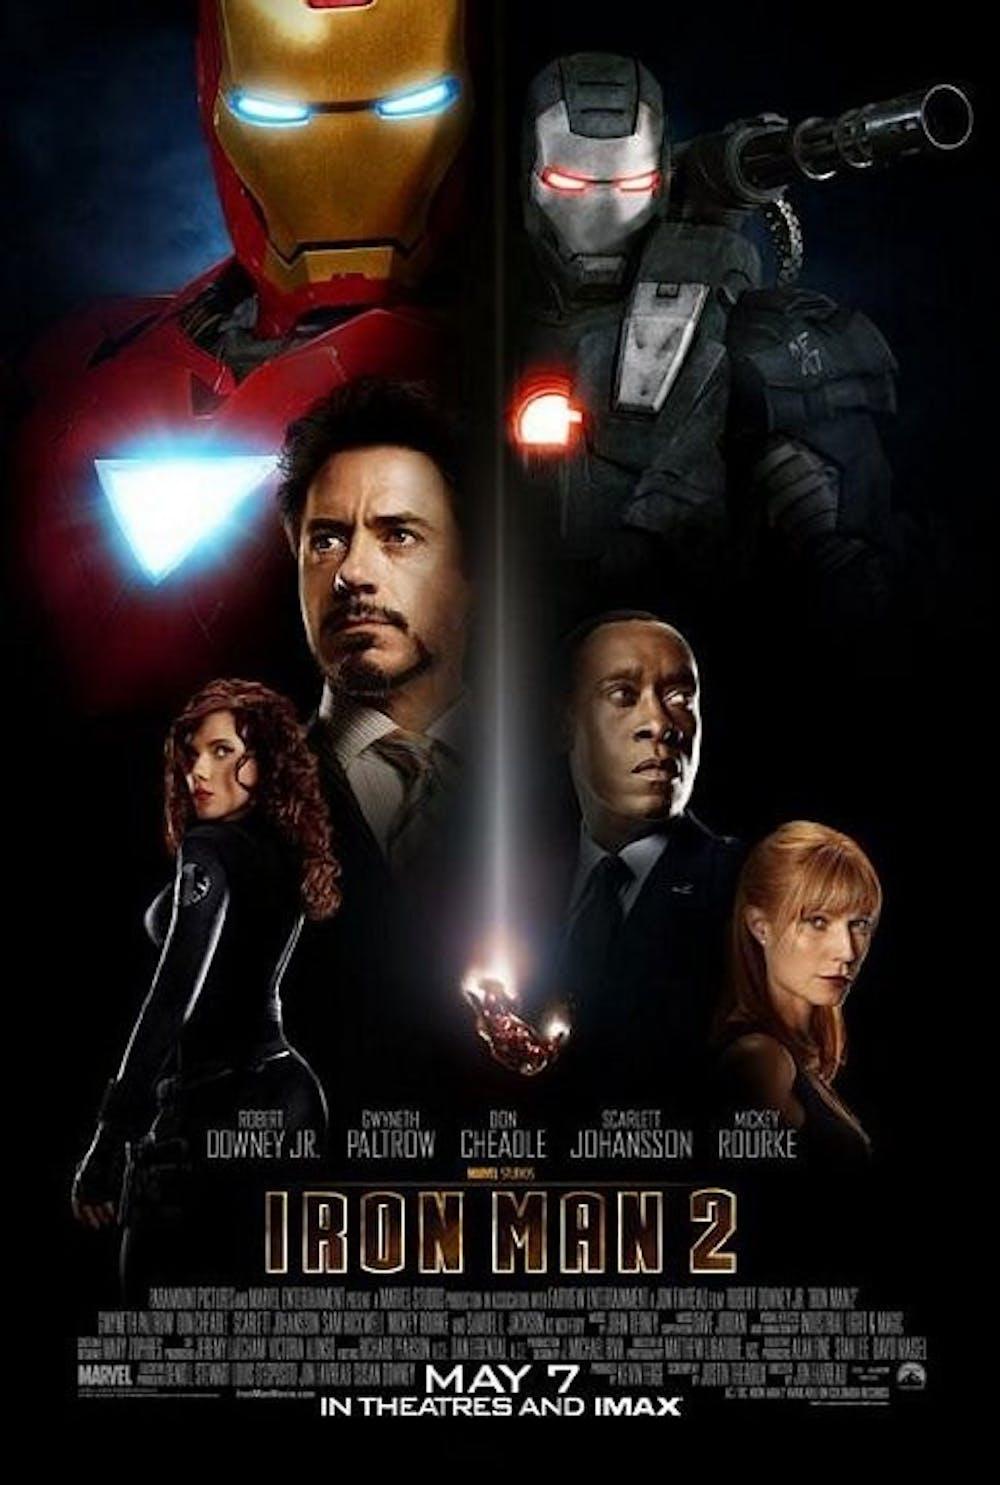 iron_man_2_movie_poster